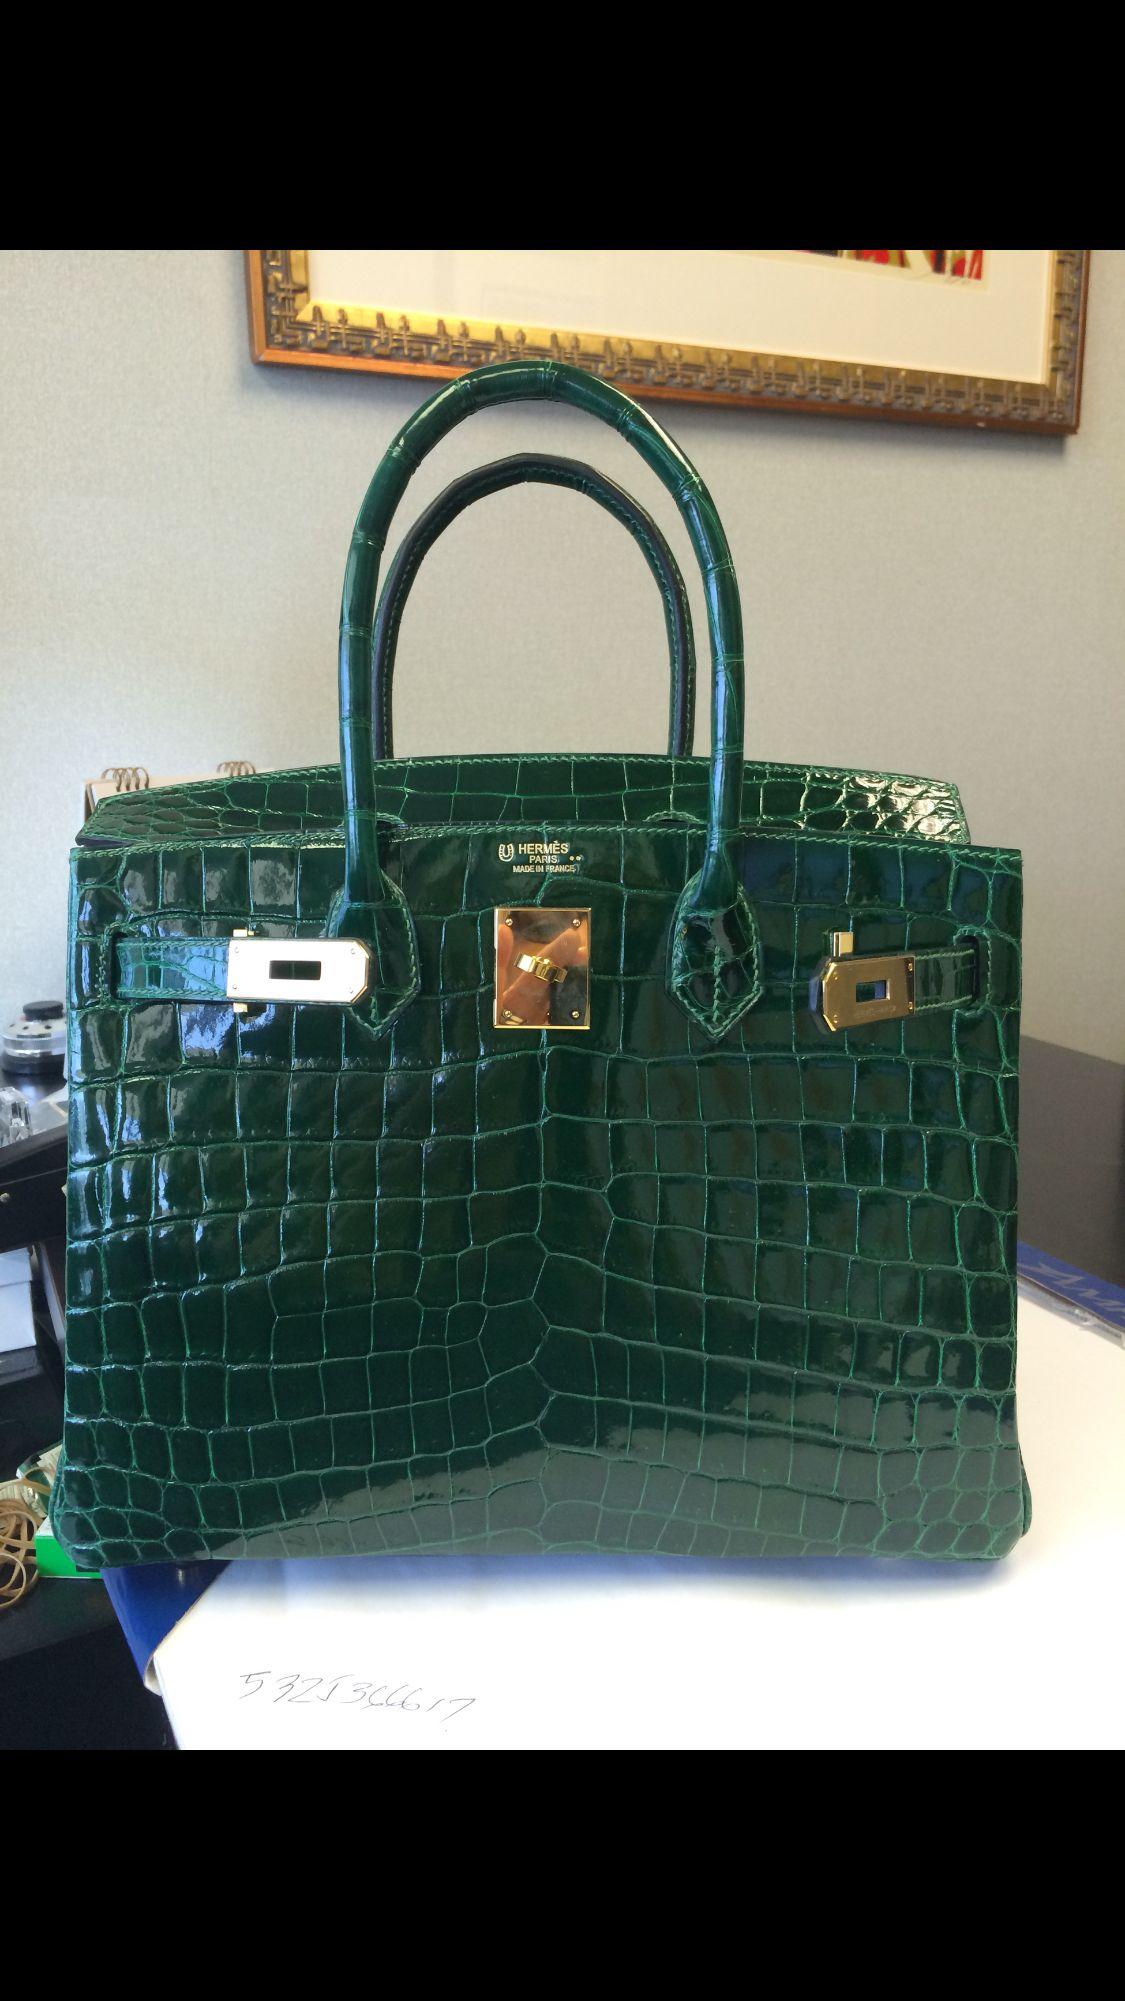 Sell Your Hermes Birkin Bags Online!